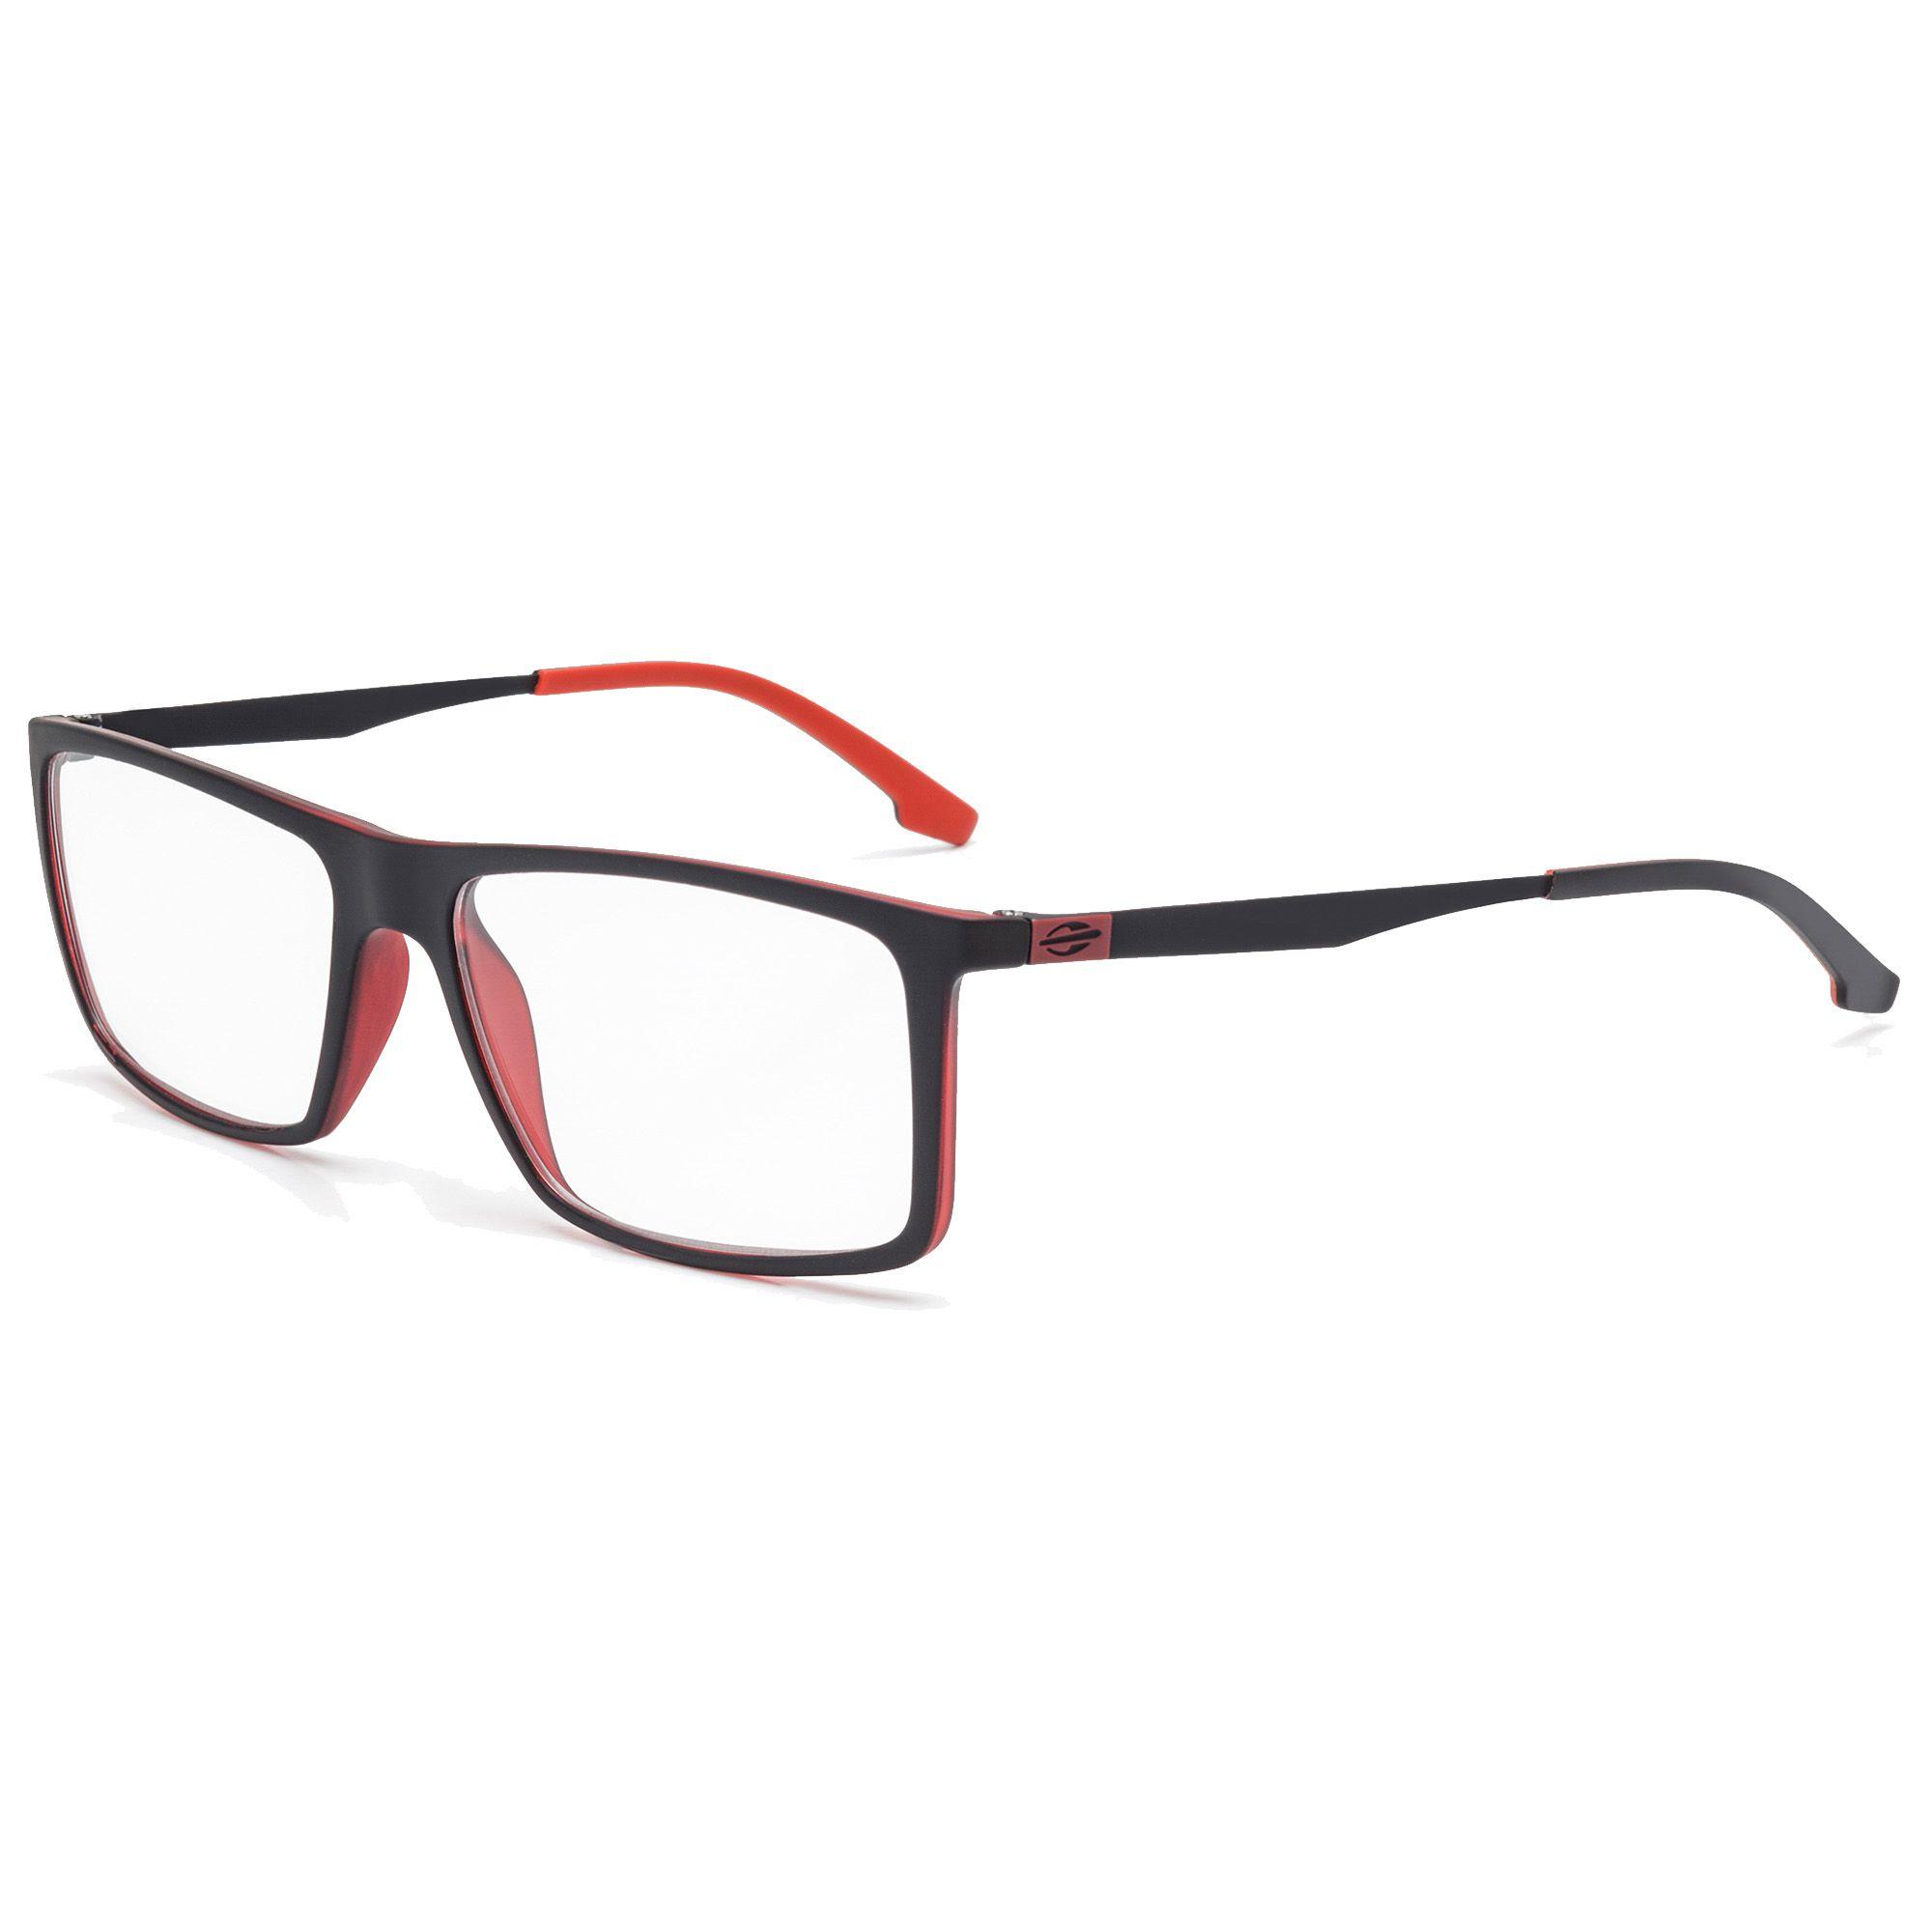 Óculos de Grau Masculino Mormaii Maha I M6054ADI56